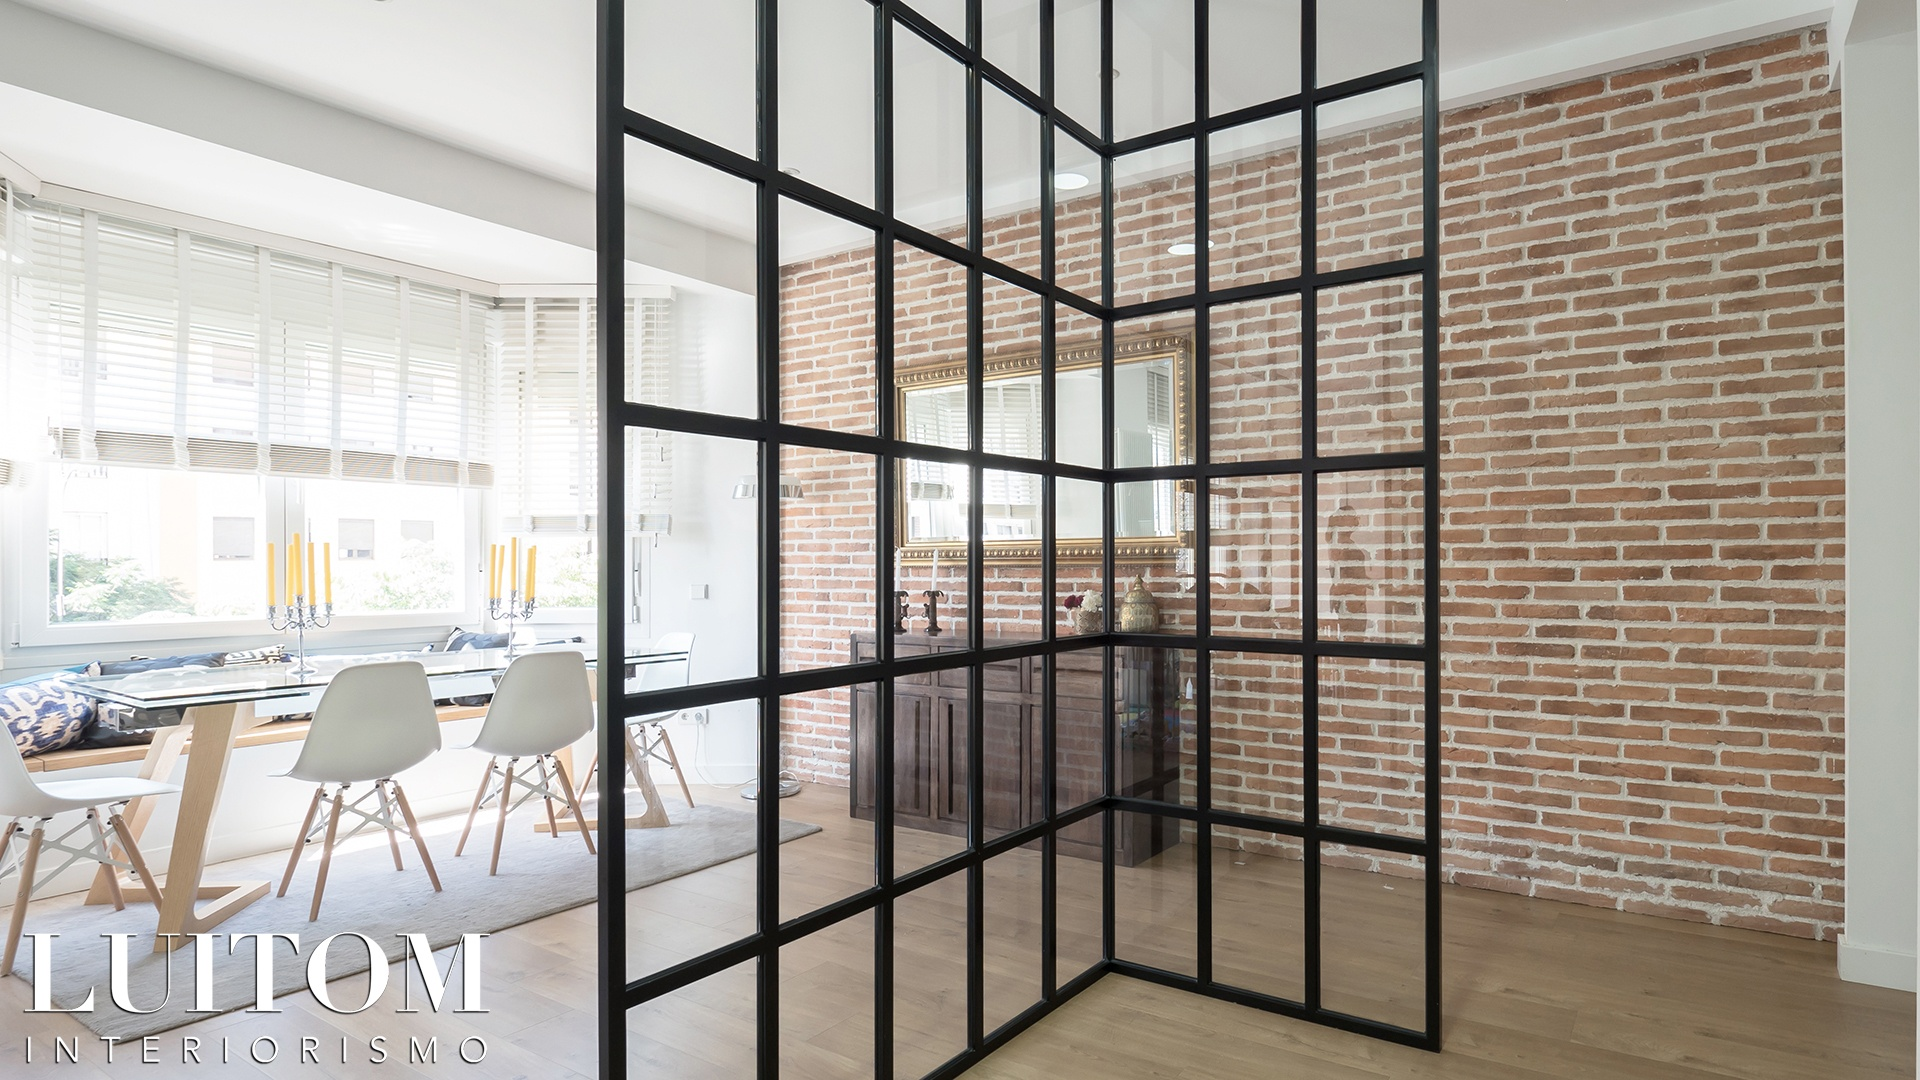 cristaleras-cocinas-pared-cristal-separacion-cocina-salon-cristalera-metalica-madera-blanca-negra-14